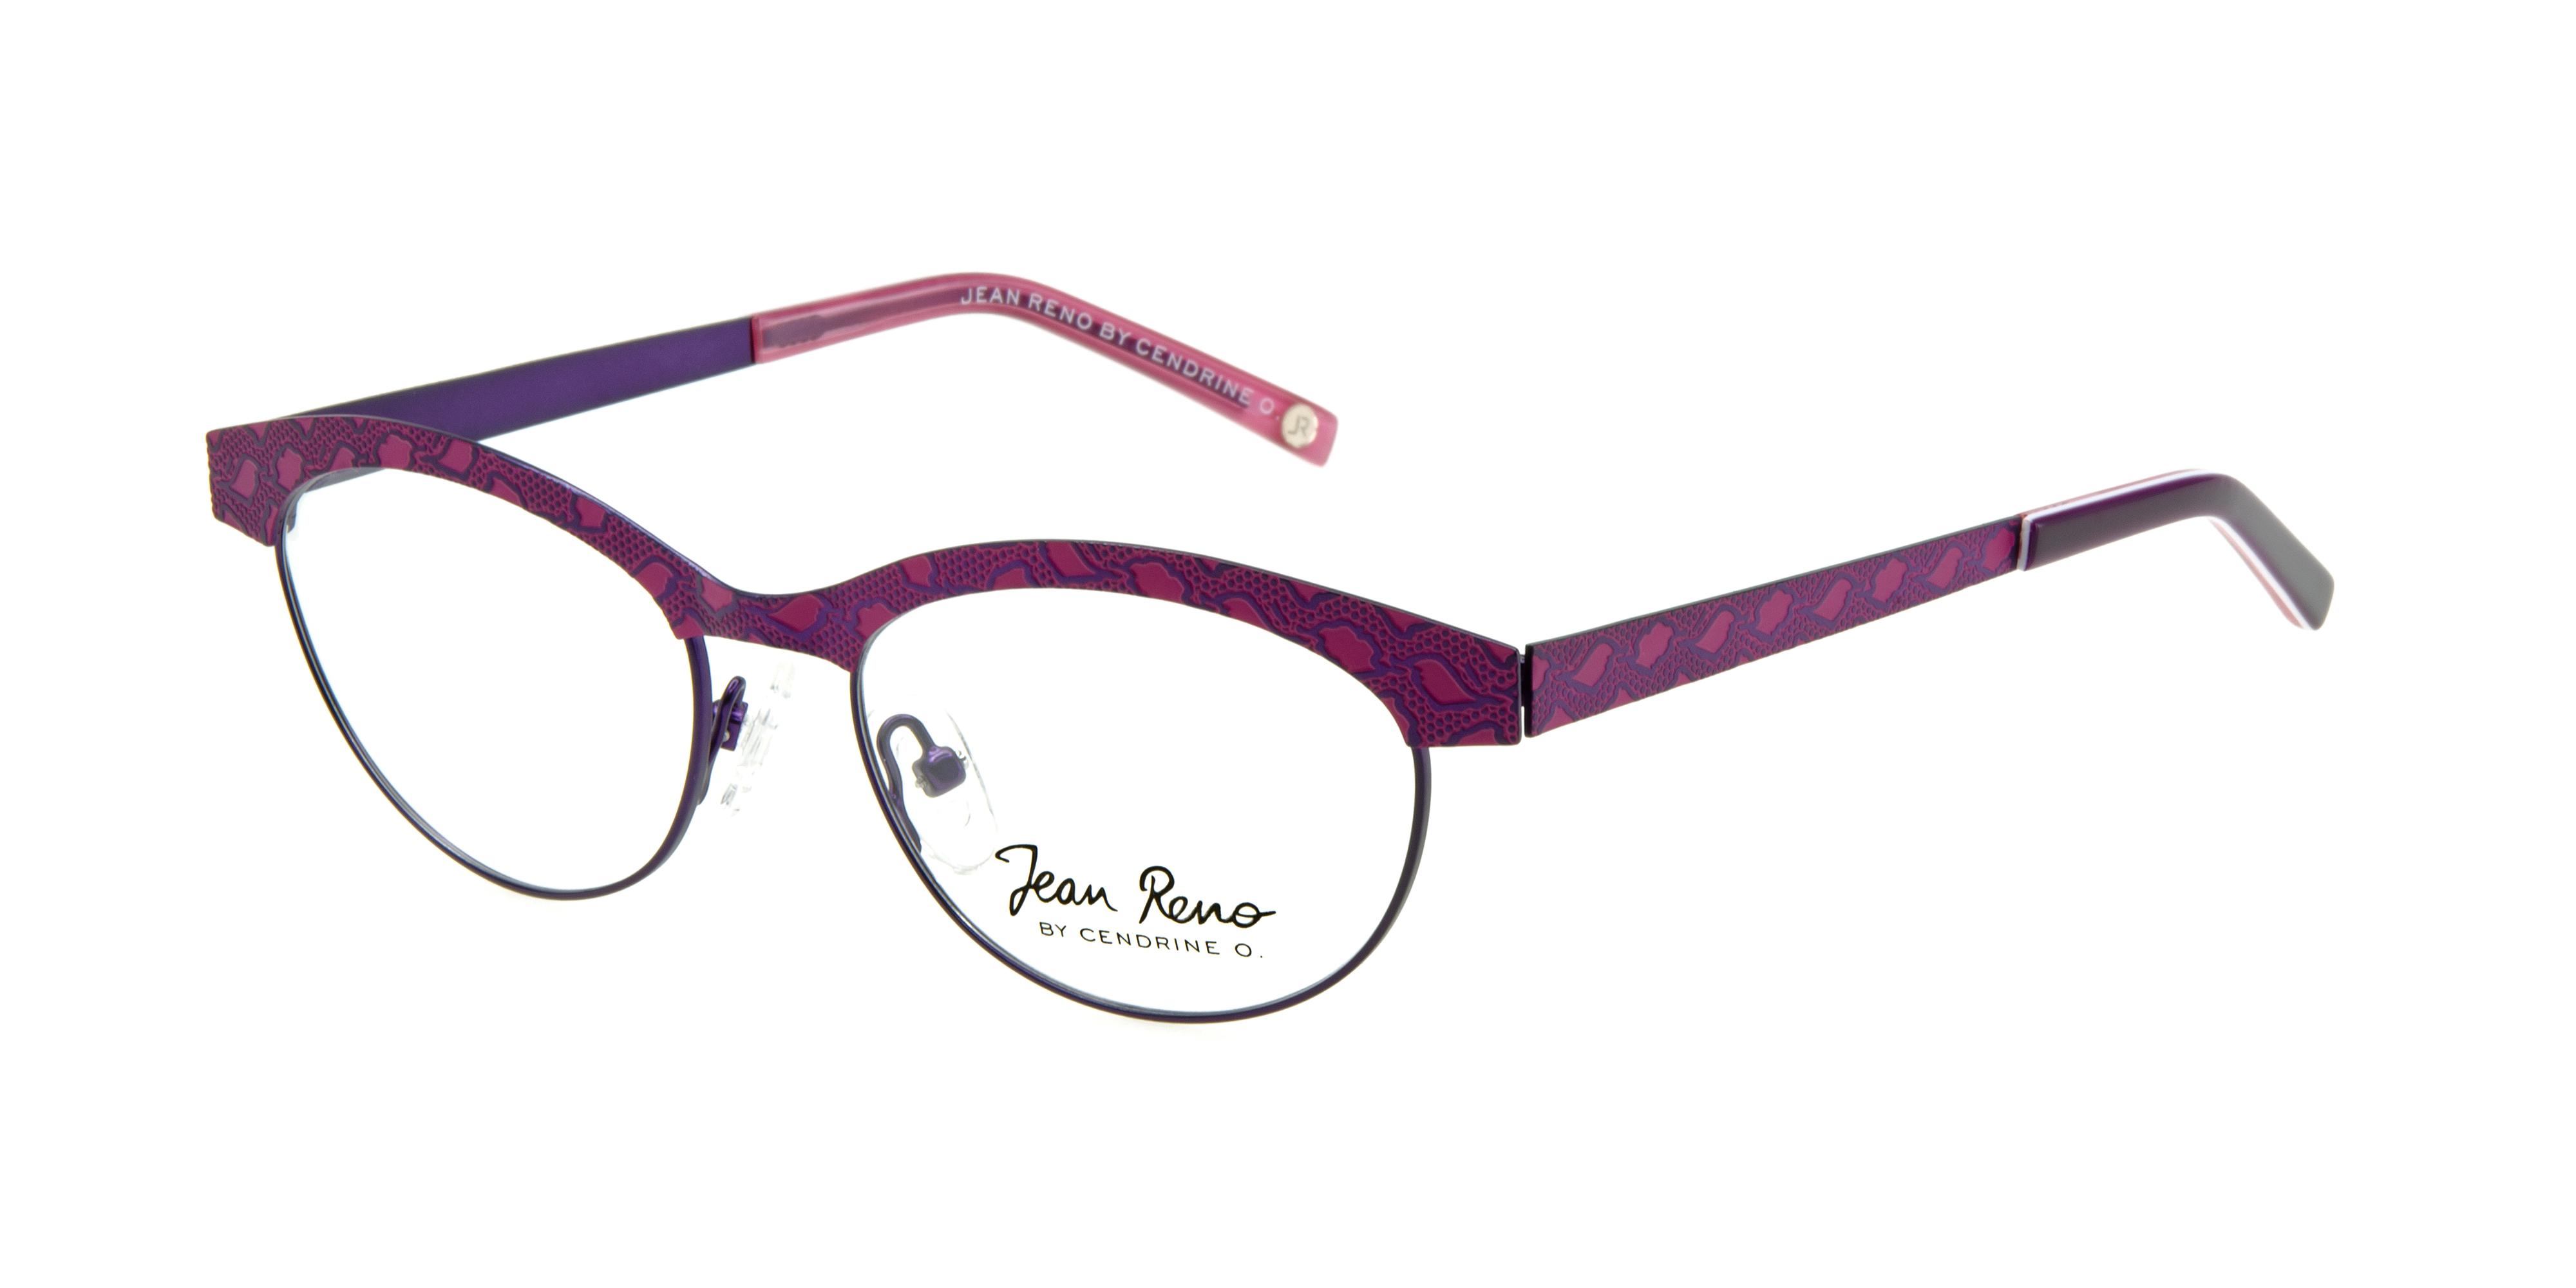 jean reno 1556 c3 zig eyewear